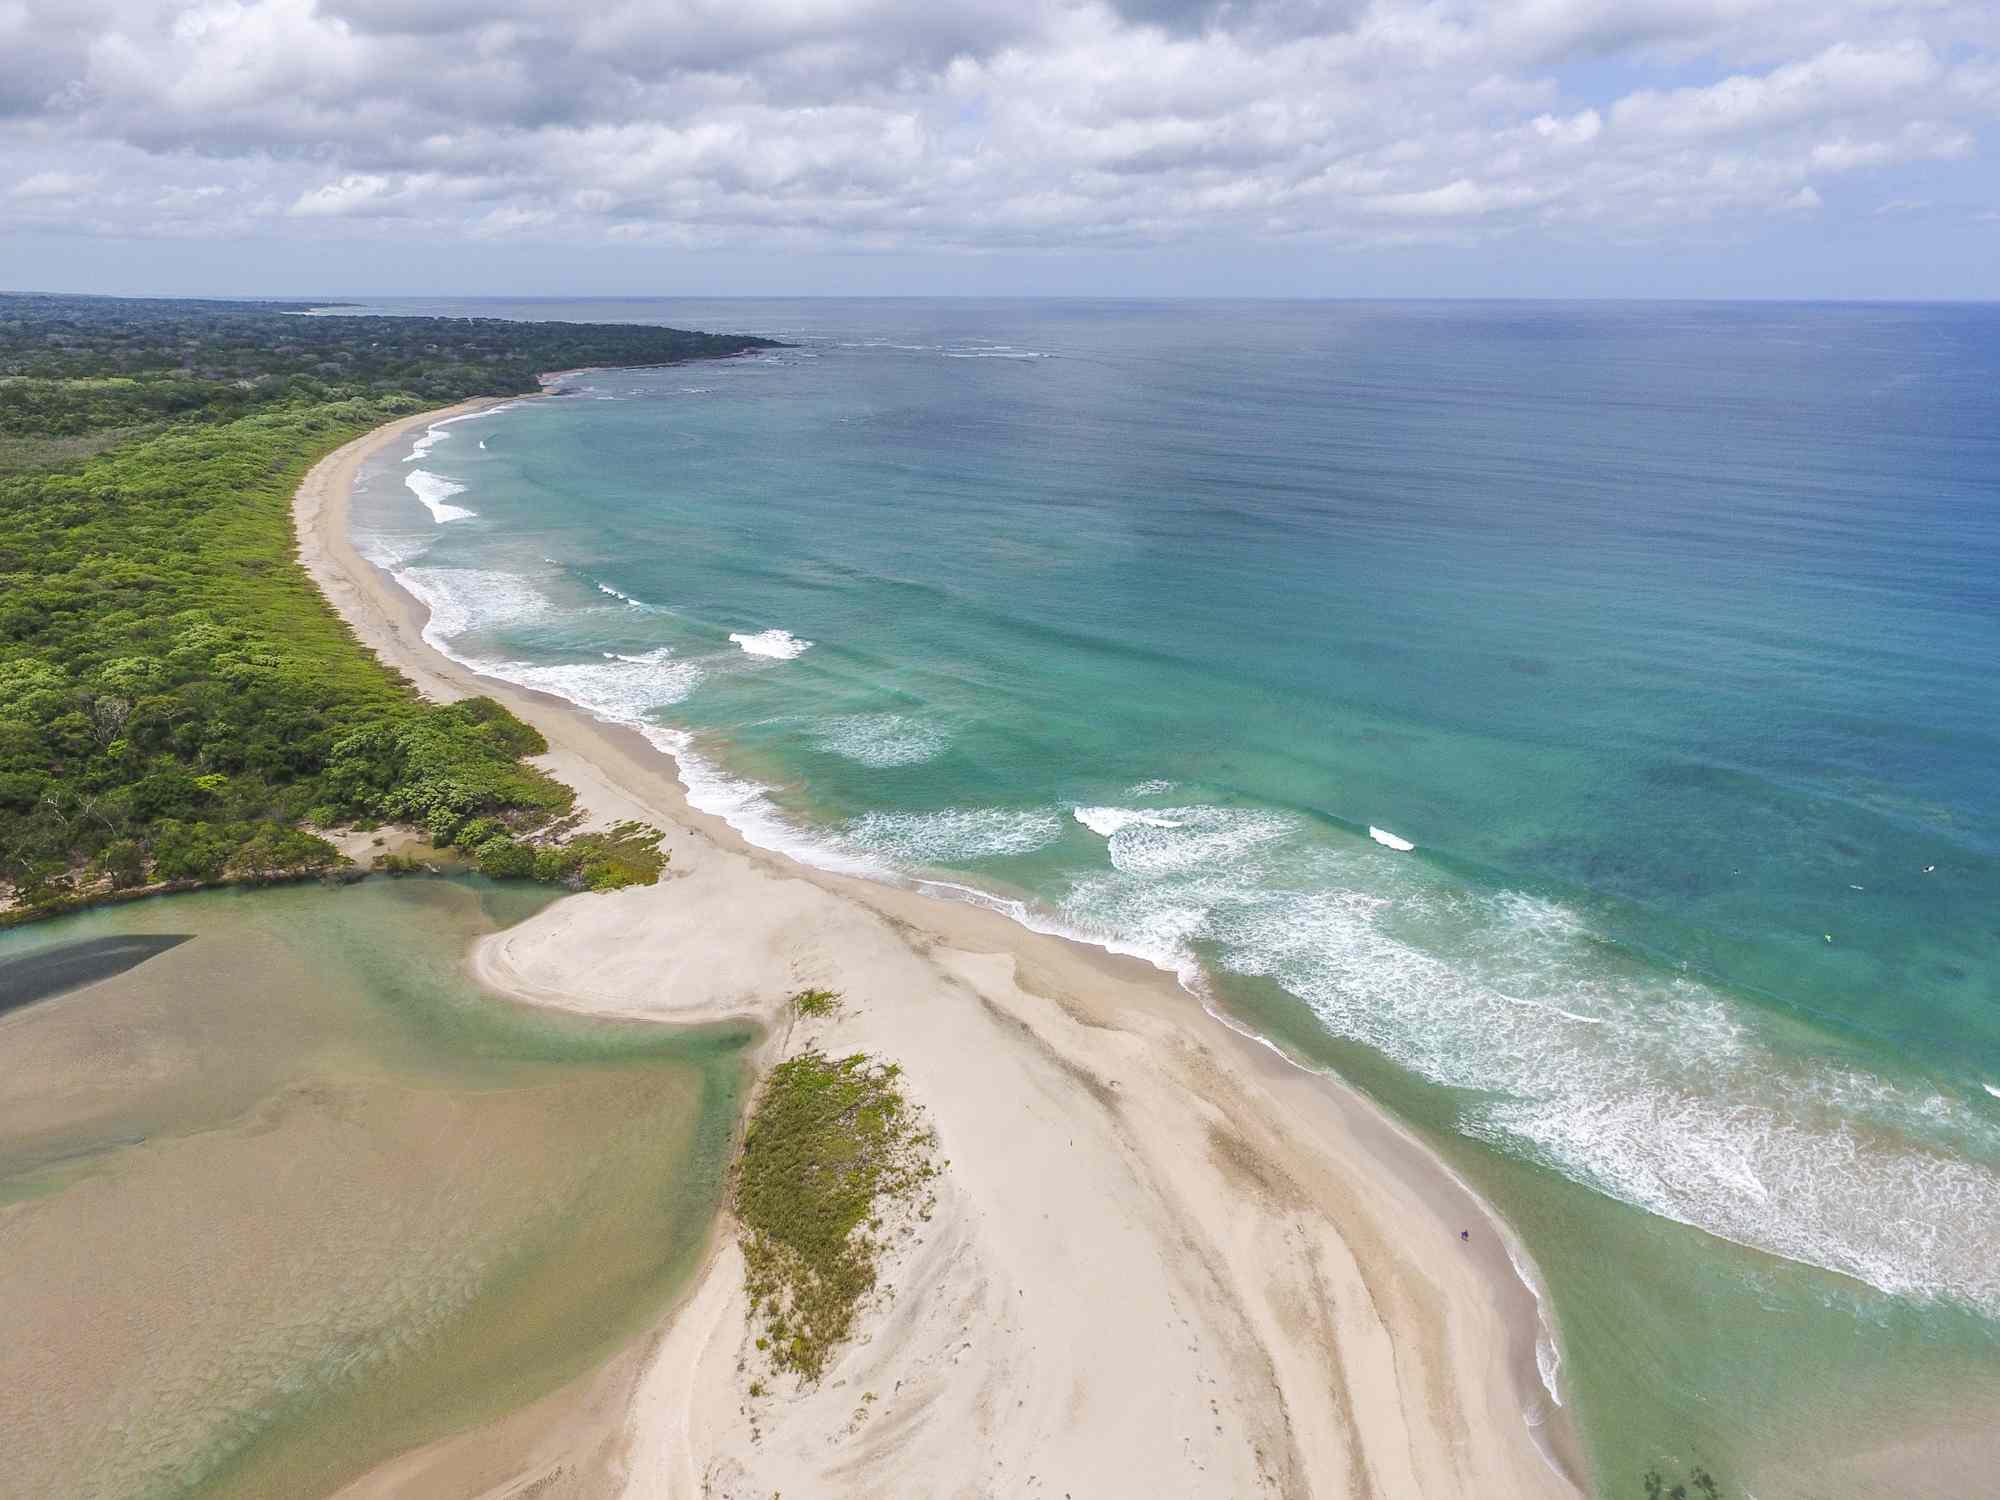 Waves breaking on Playa Tamarindo